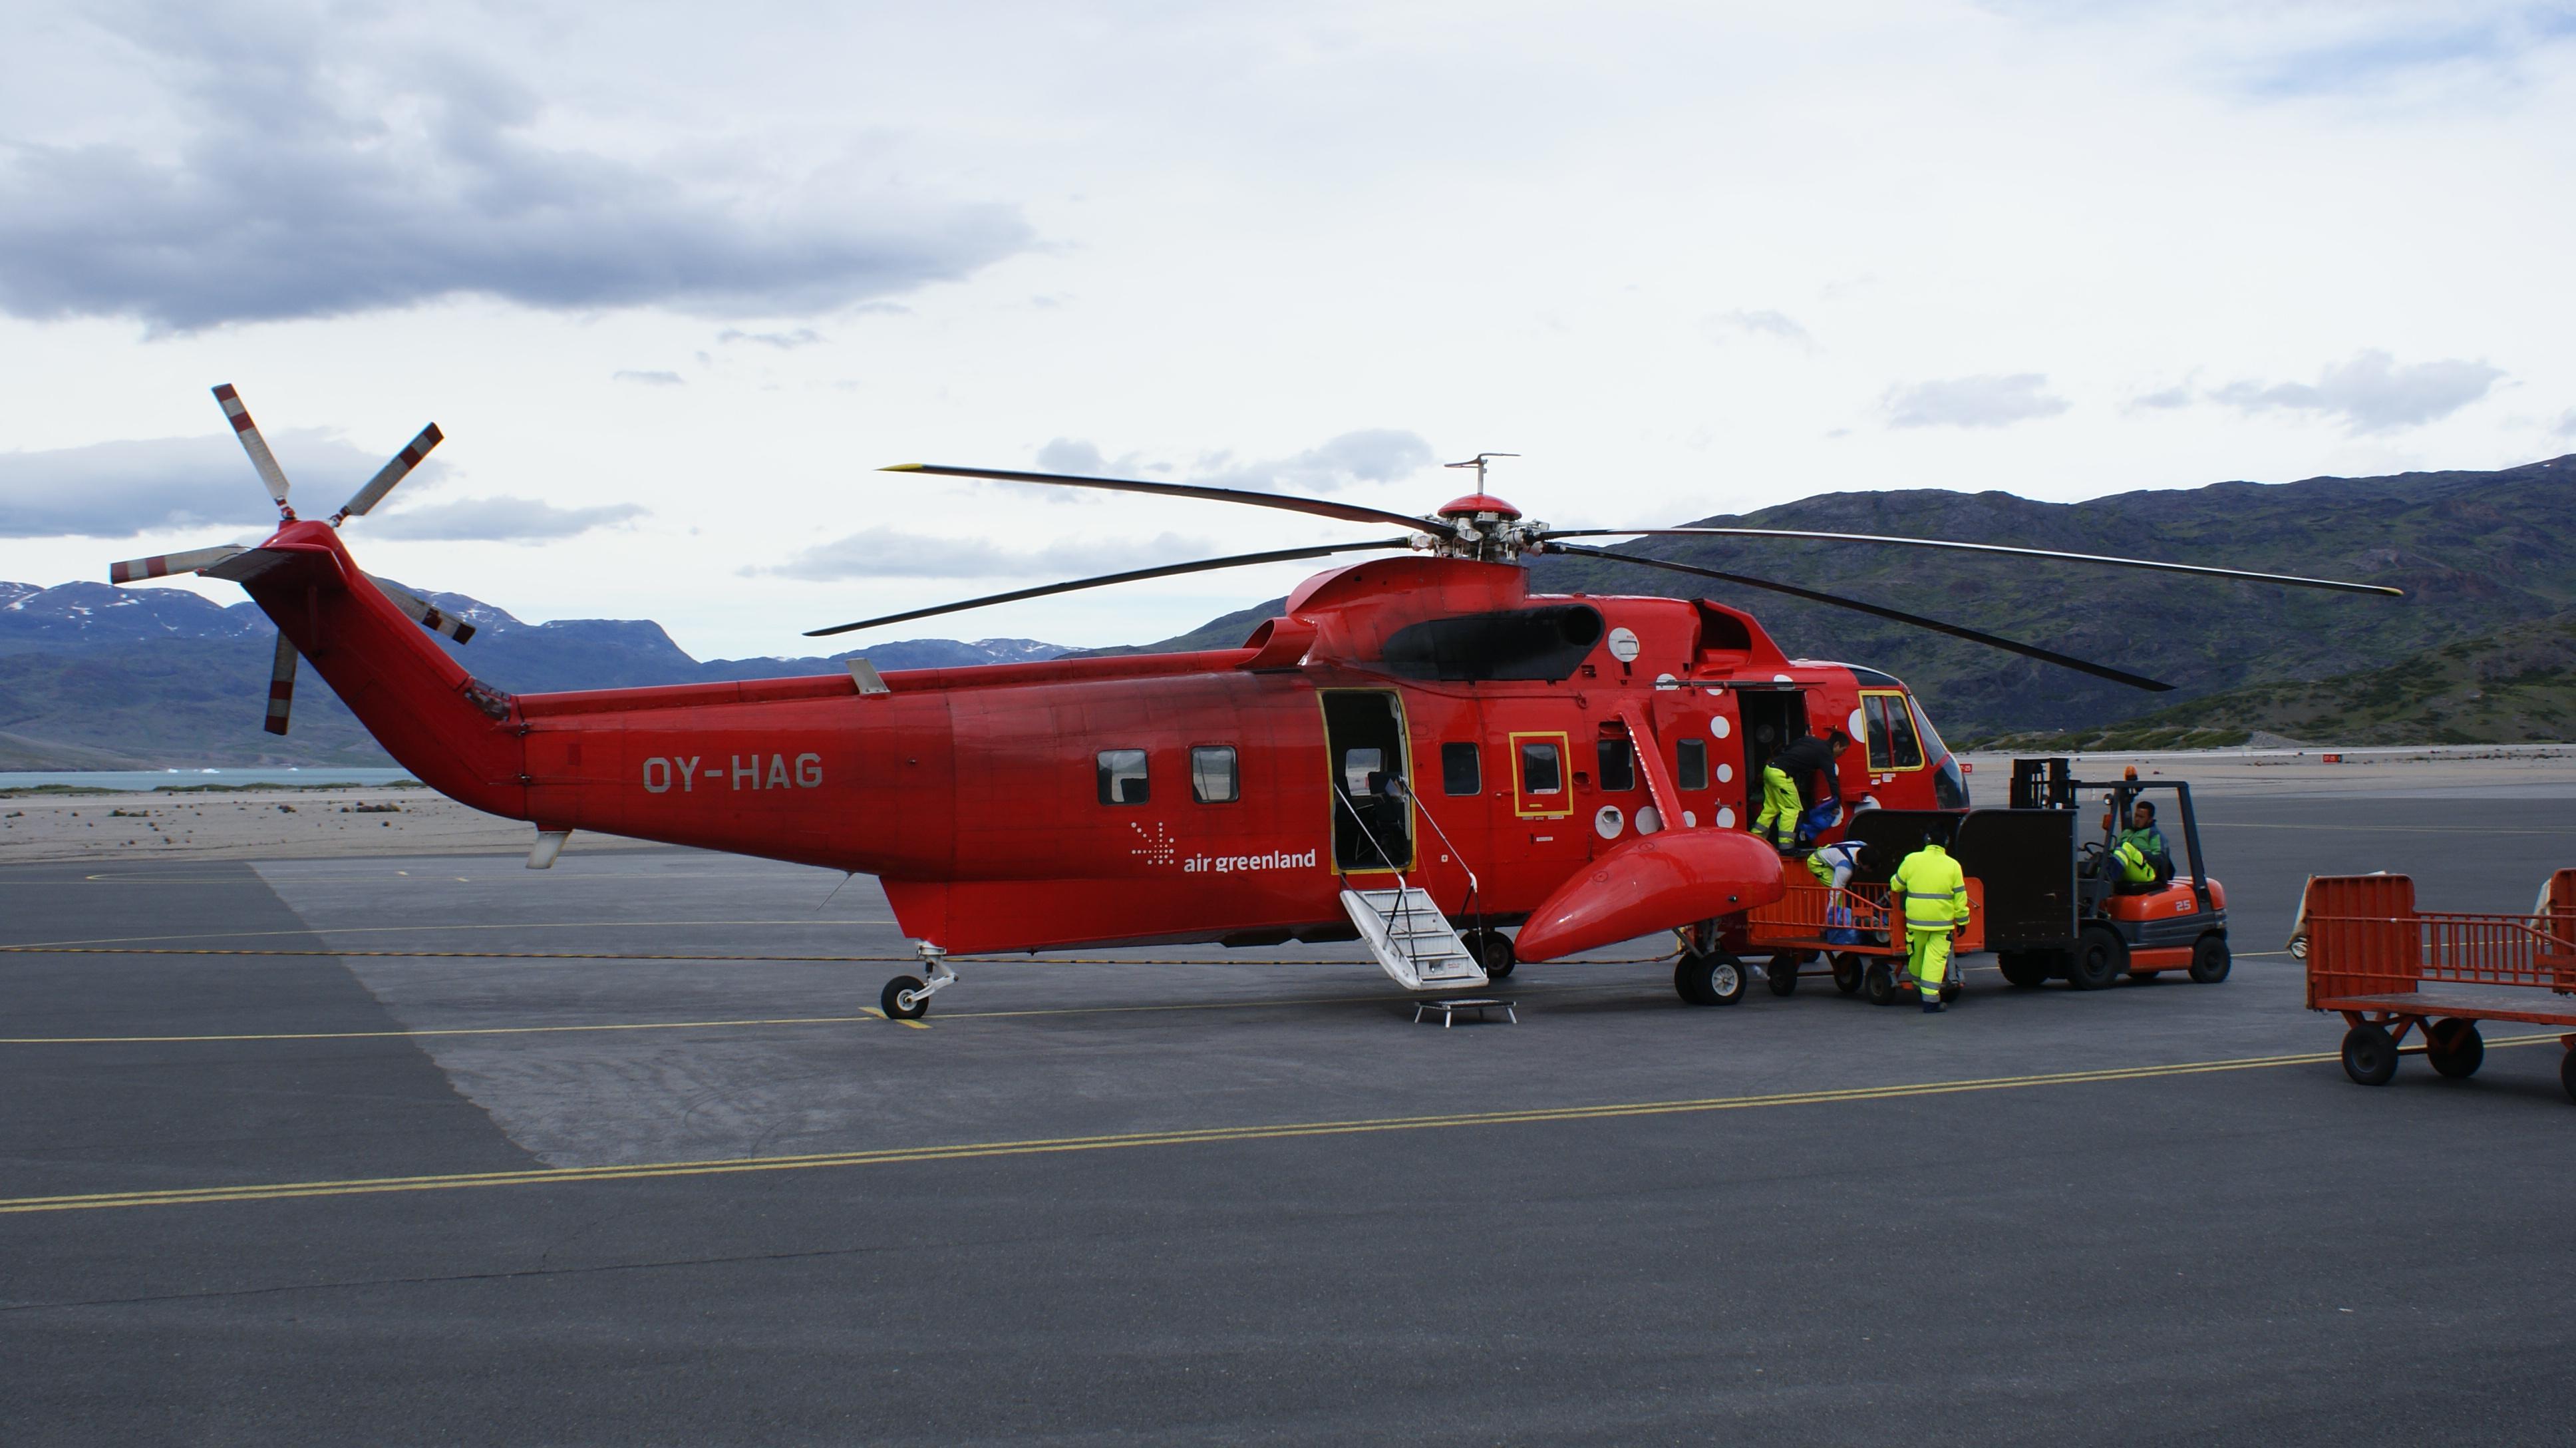 Groenlandia helicoptero rojo